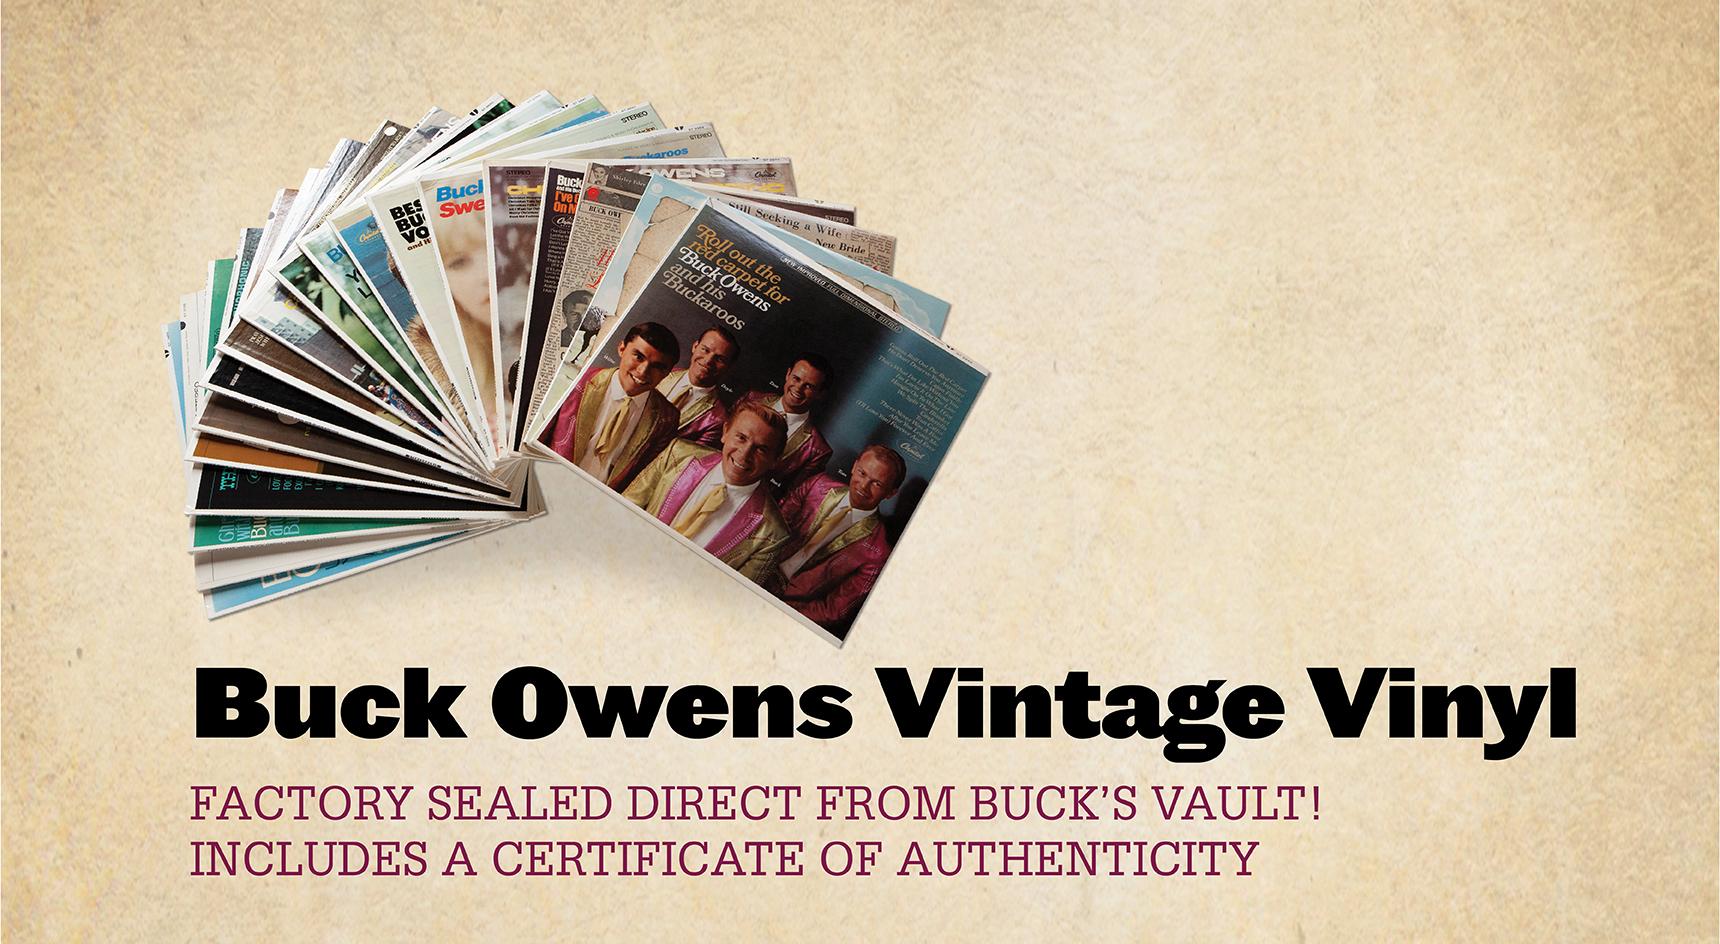 Buck Owens Vintage Vinyl Home Page News